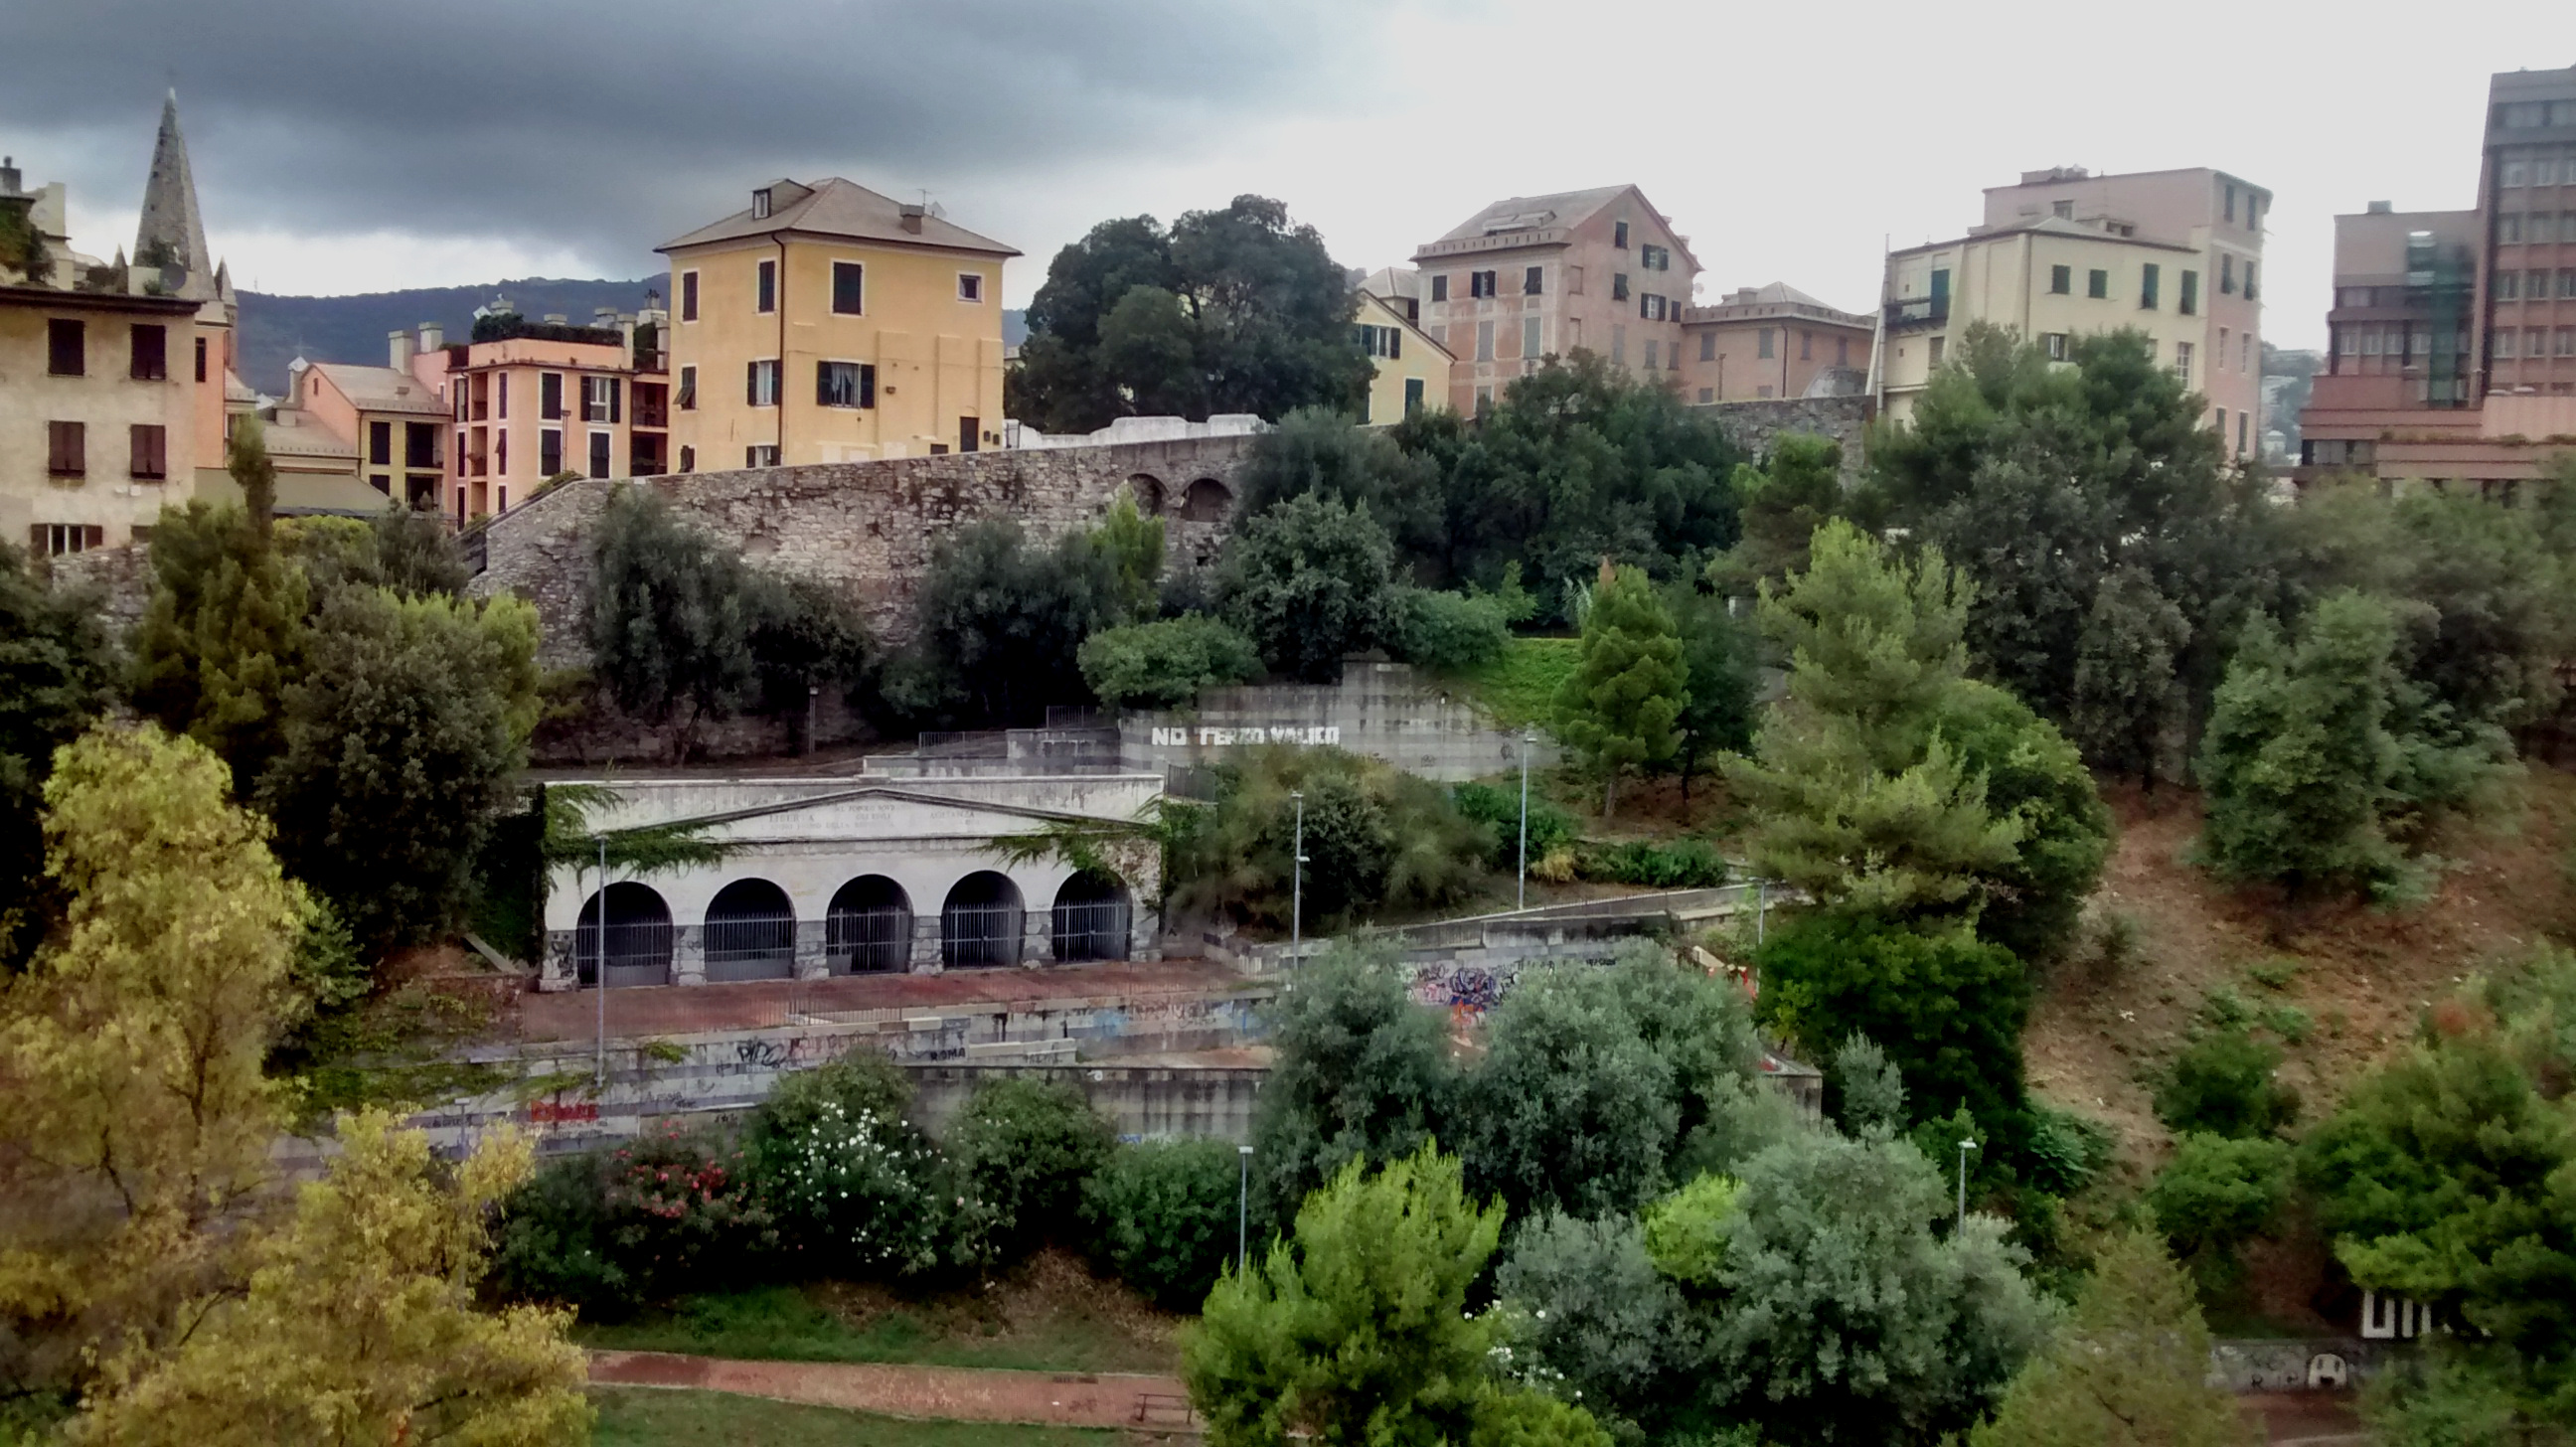 Giardini Di Plastica Genova.File Giardini Baltimora Genova Jpg Wikipedia